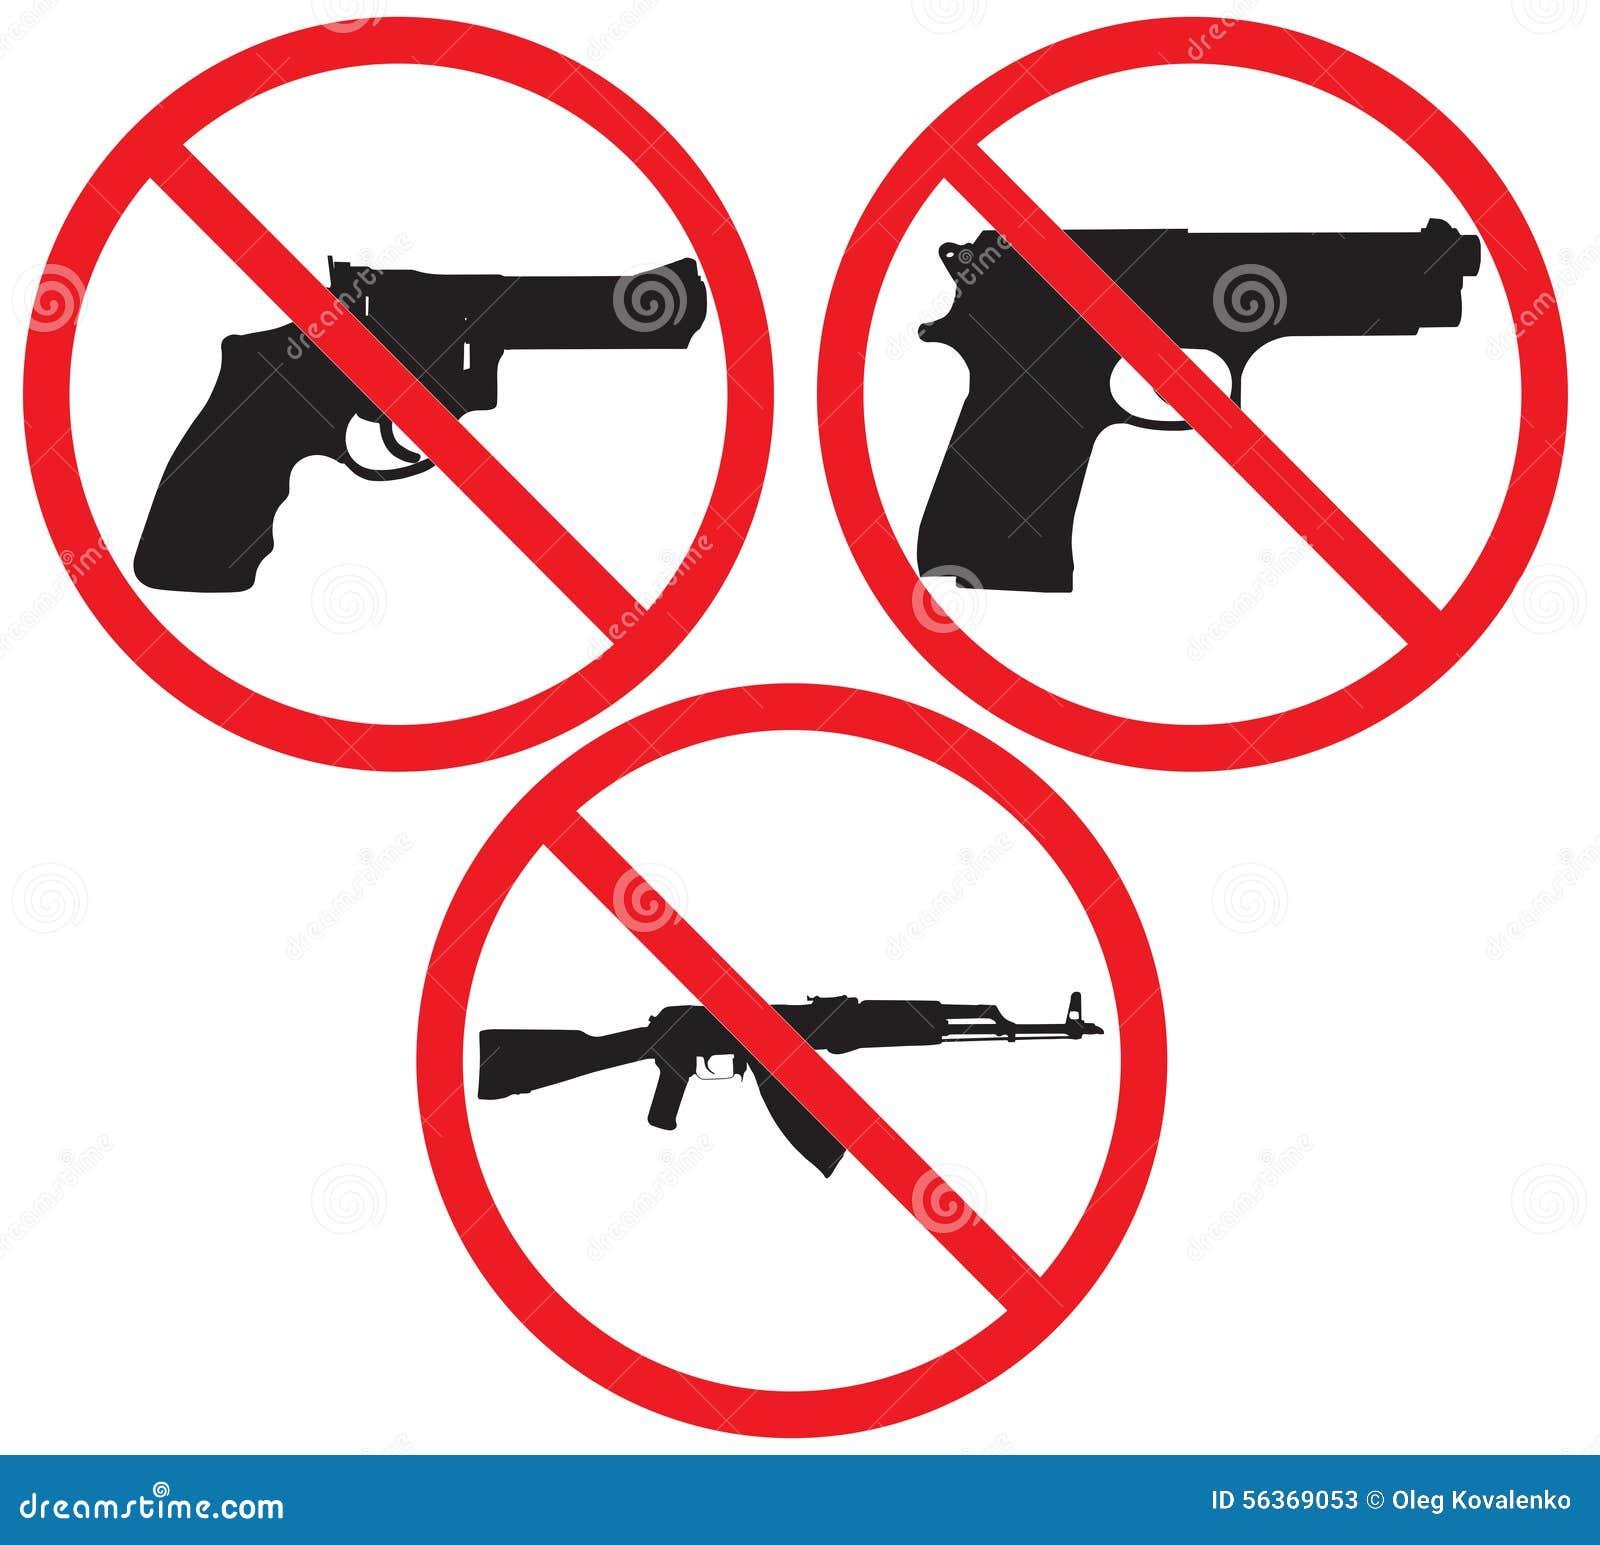 No gun sign stock vector illustration of ak47 caution 56369053 no gun sign biocorpaavc